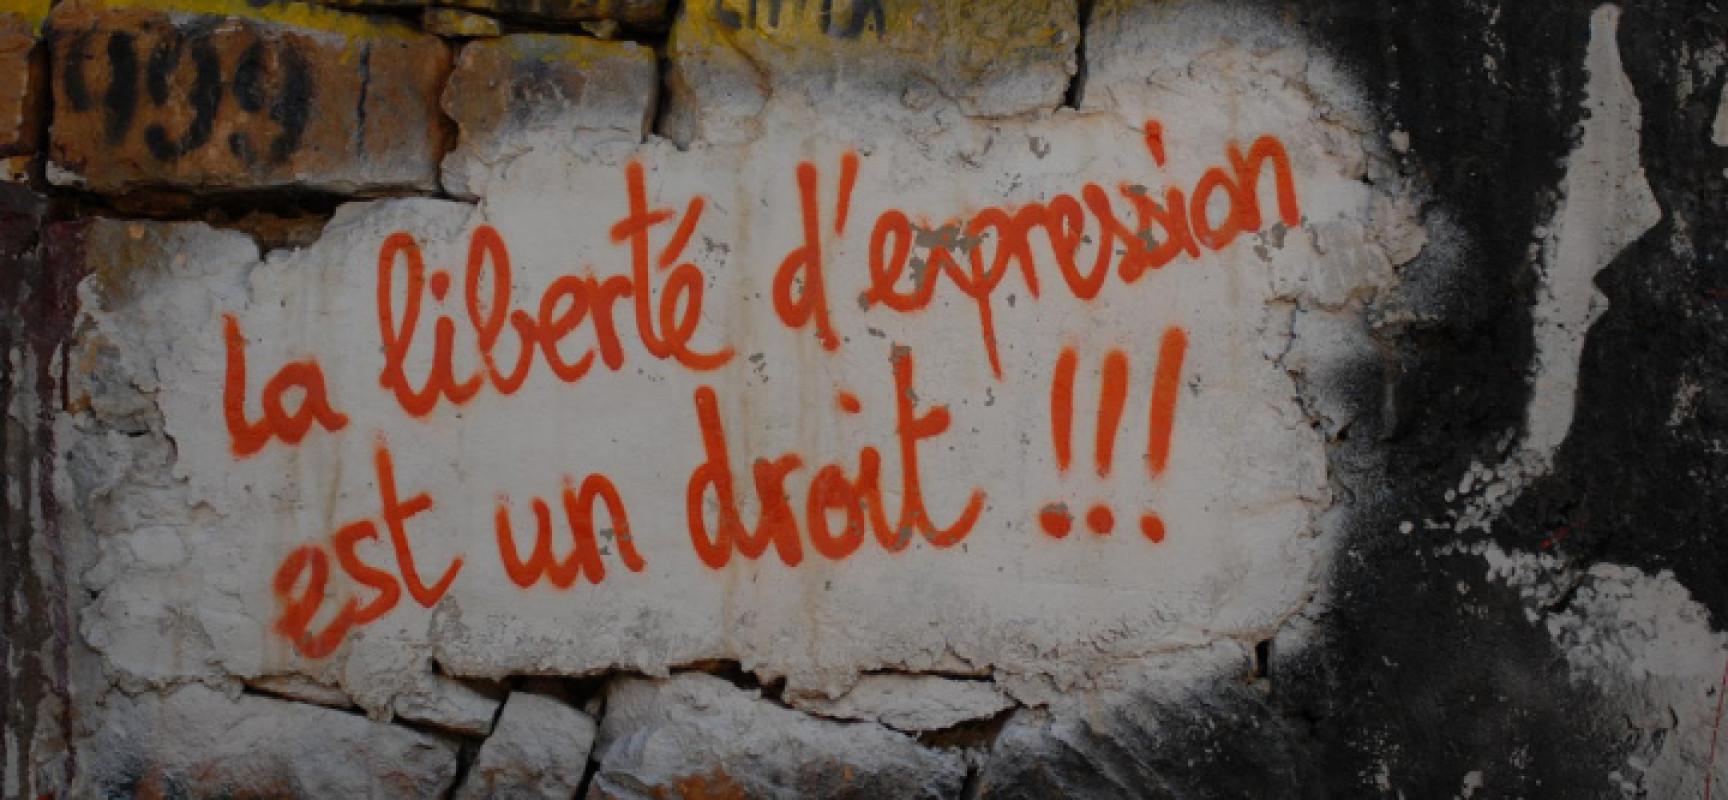 Rétablir la liberté d'expression en France